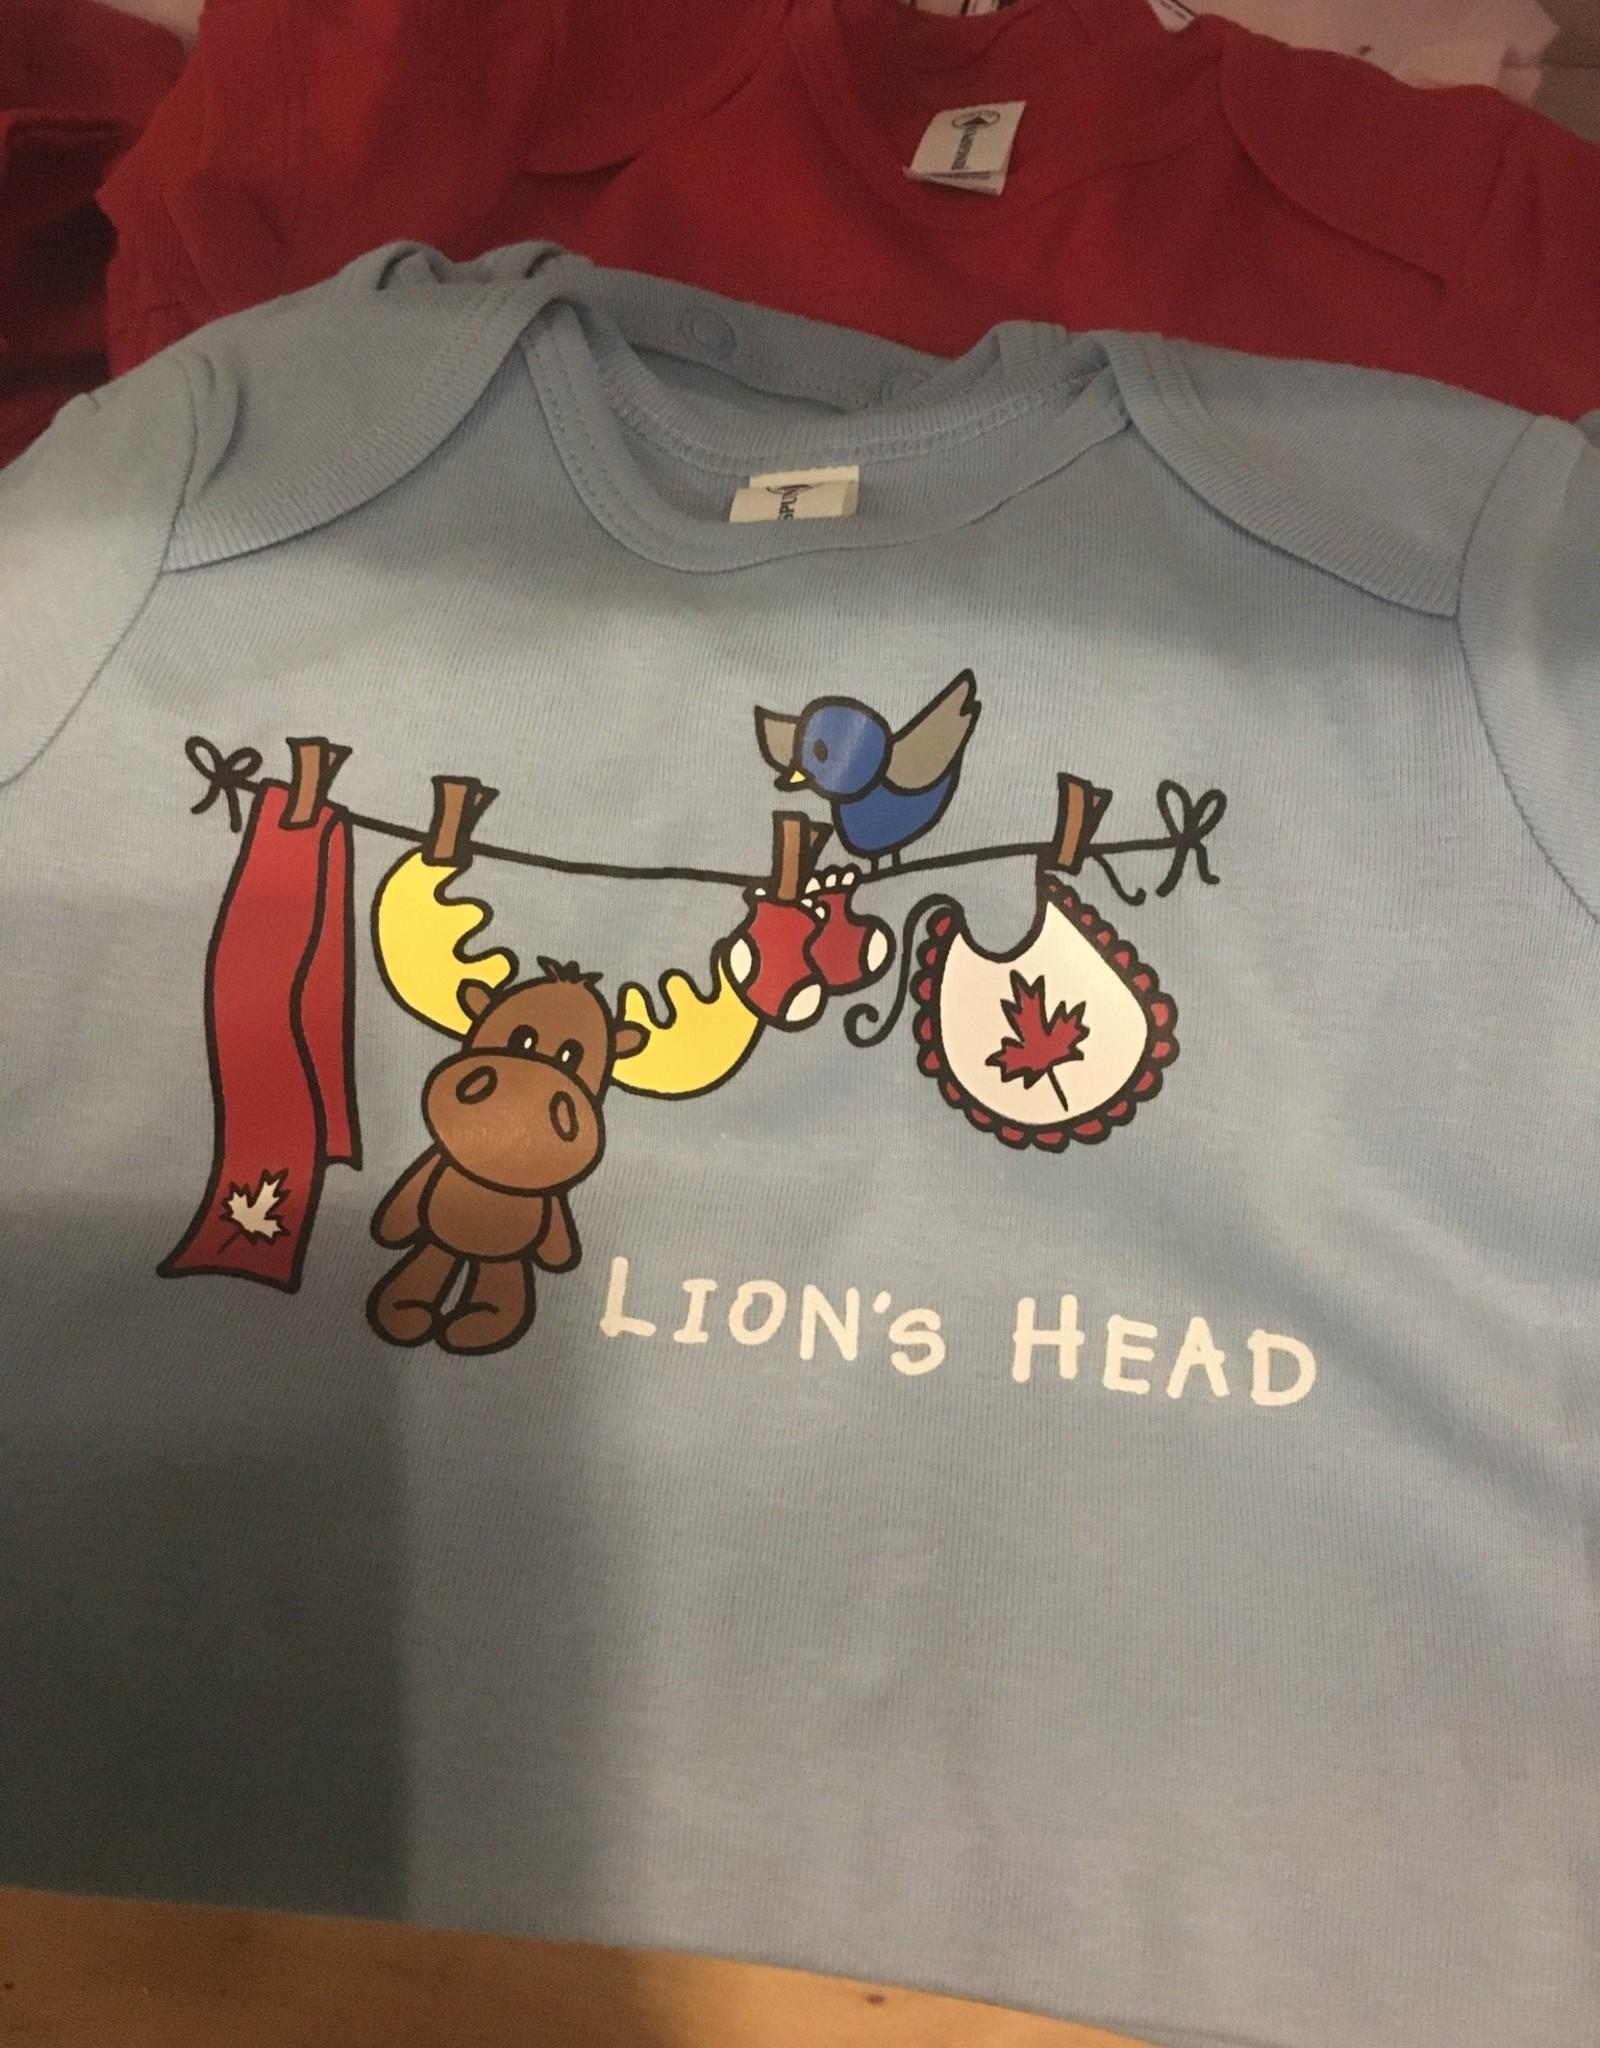 Delta Lion's Head Onesies